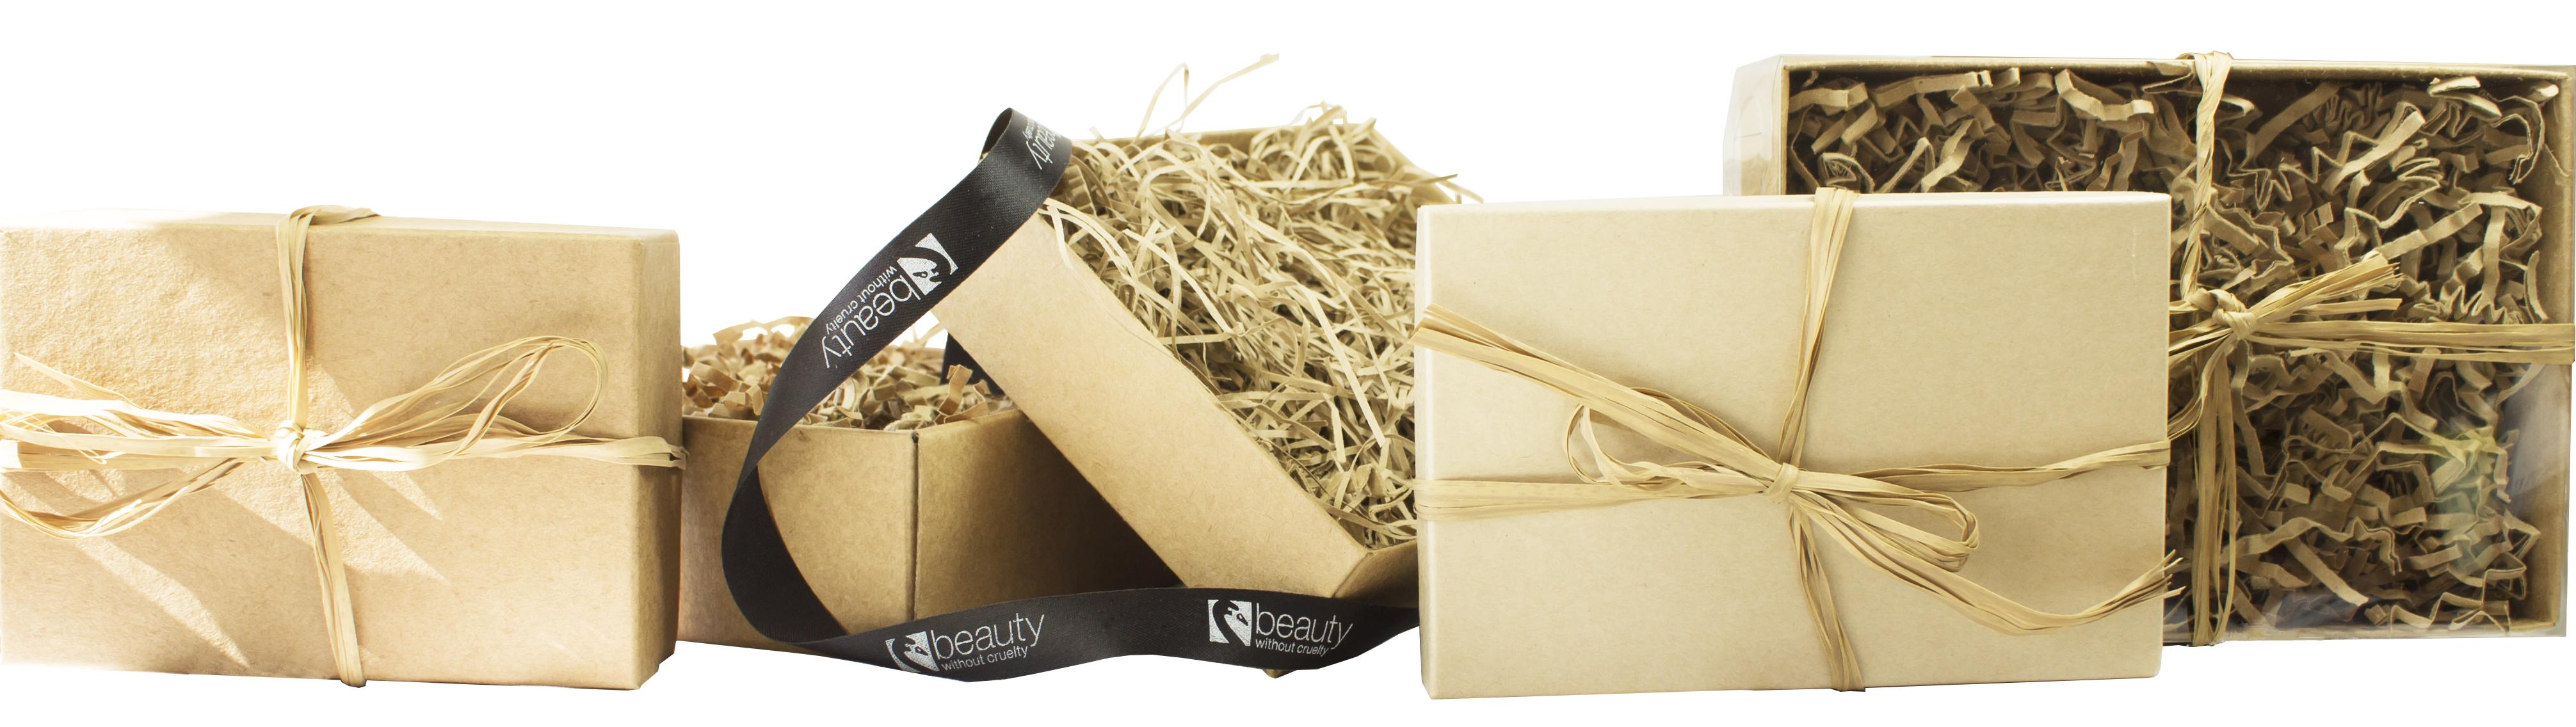 bwc-packaging-banner.jpg